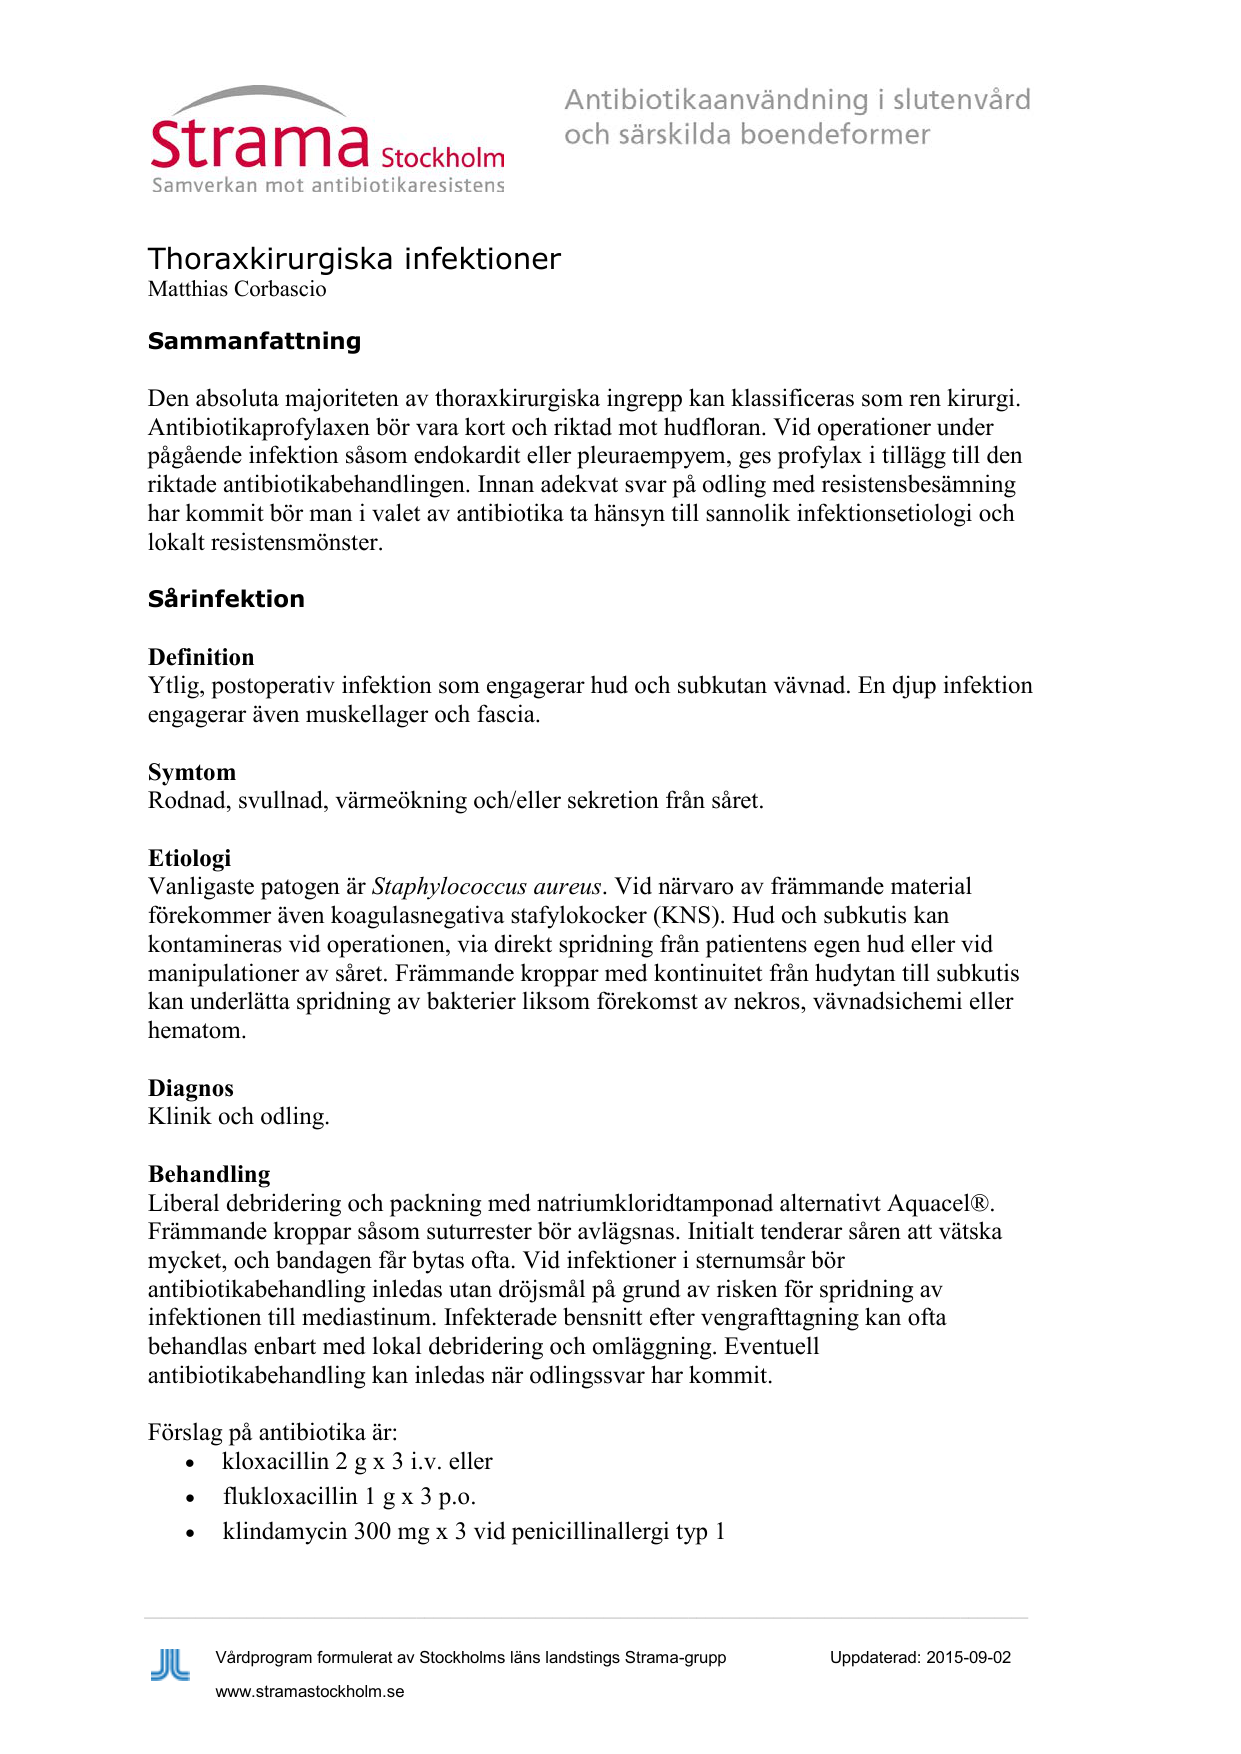 koagulasnegativa stafylokocker antibiotika